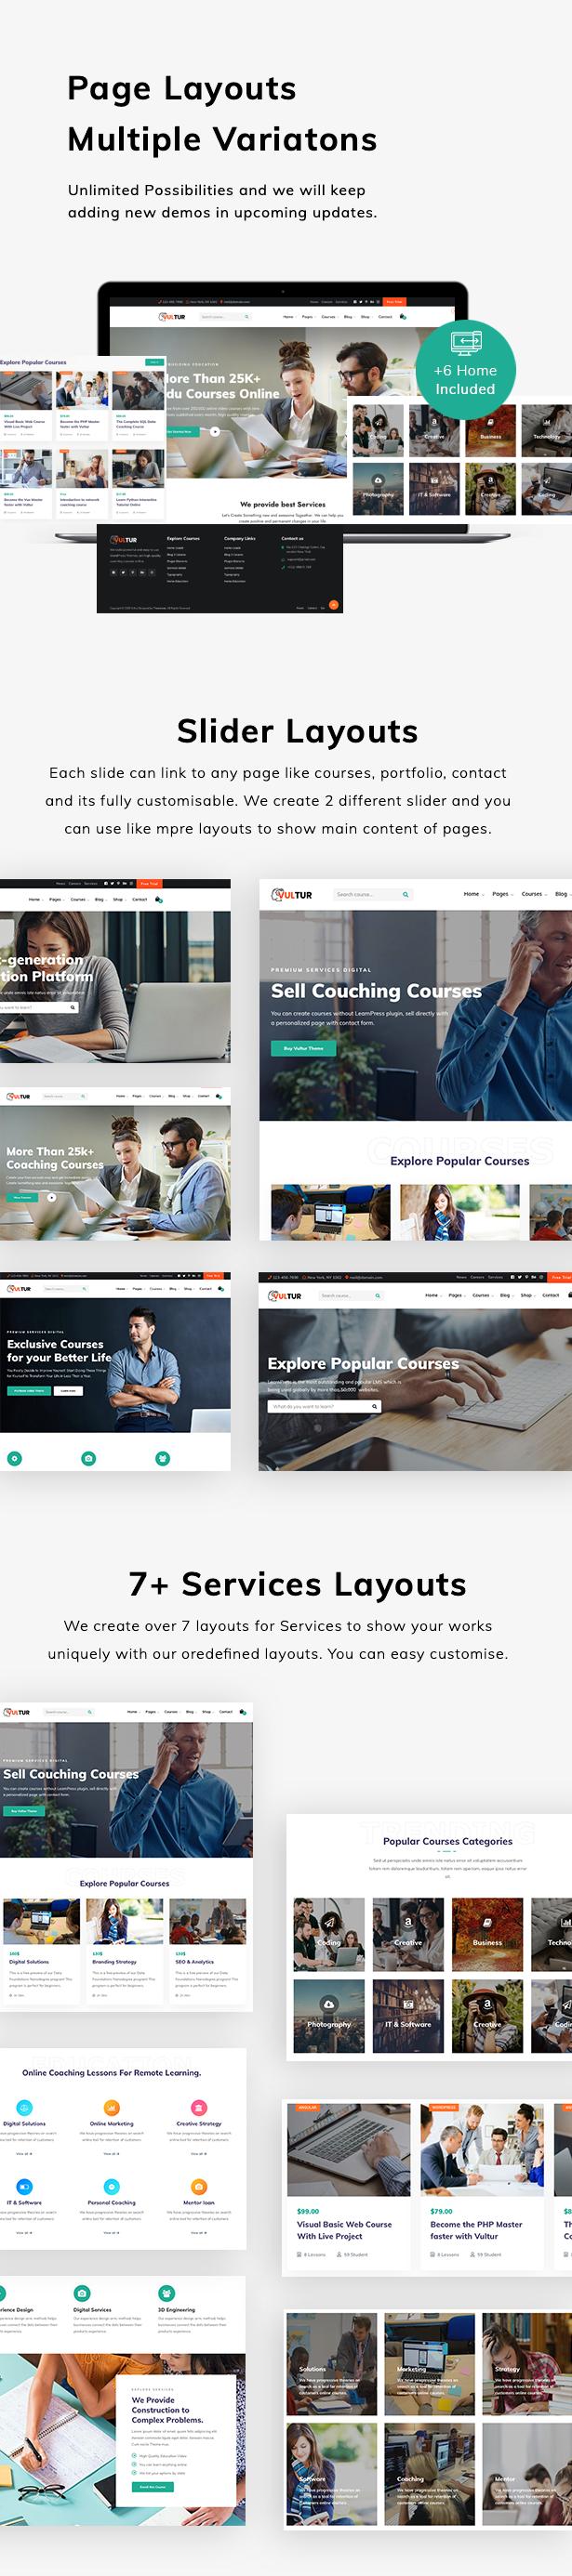 Vultur - LMS Education WordPress - 4